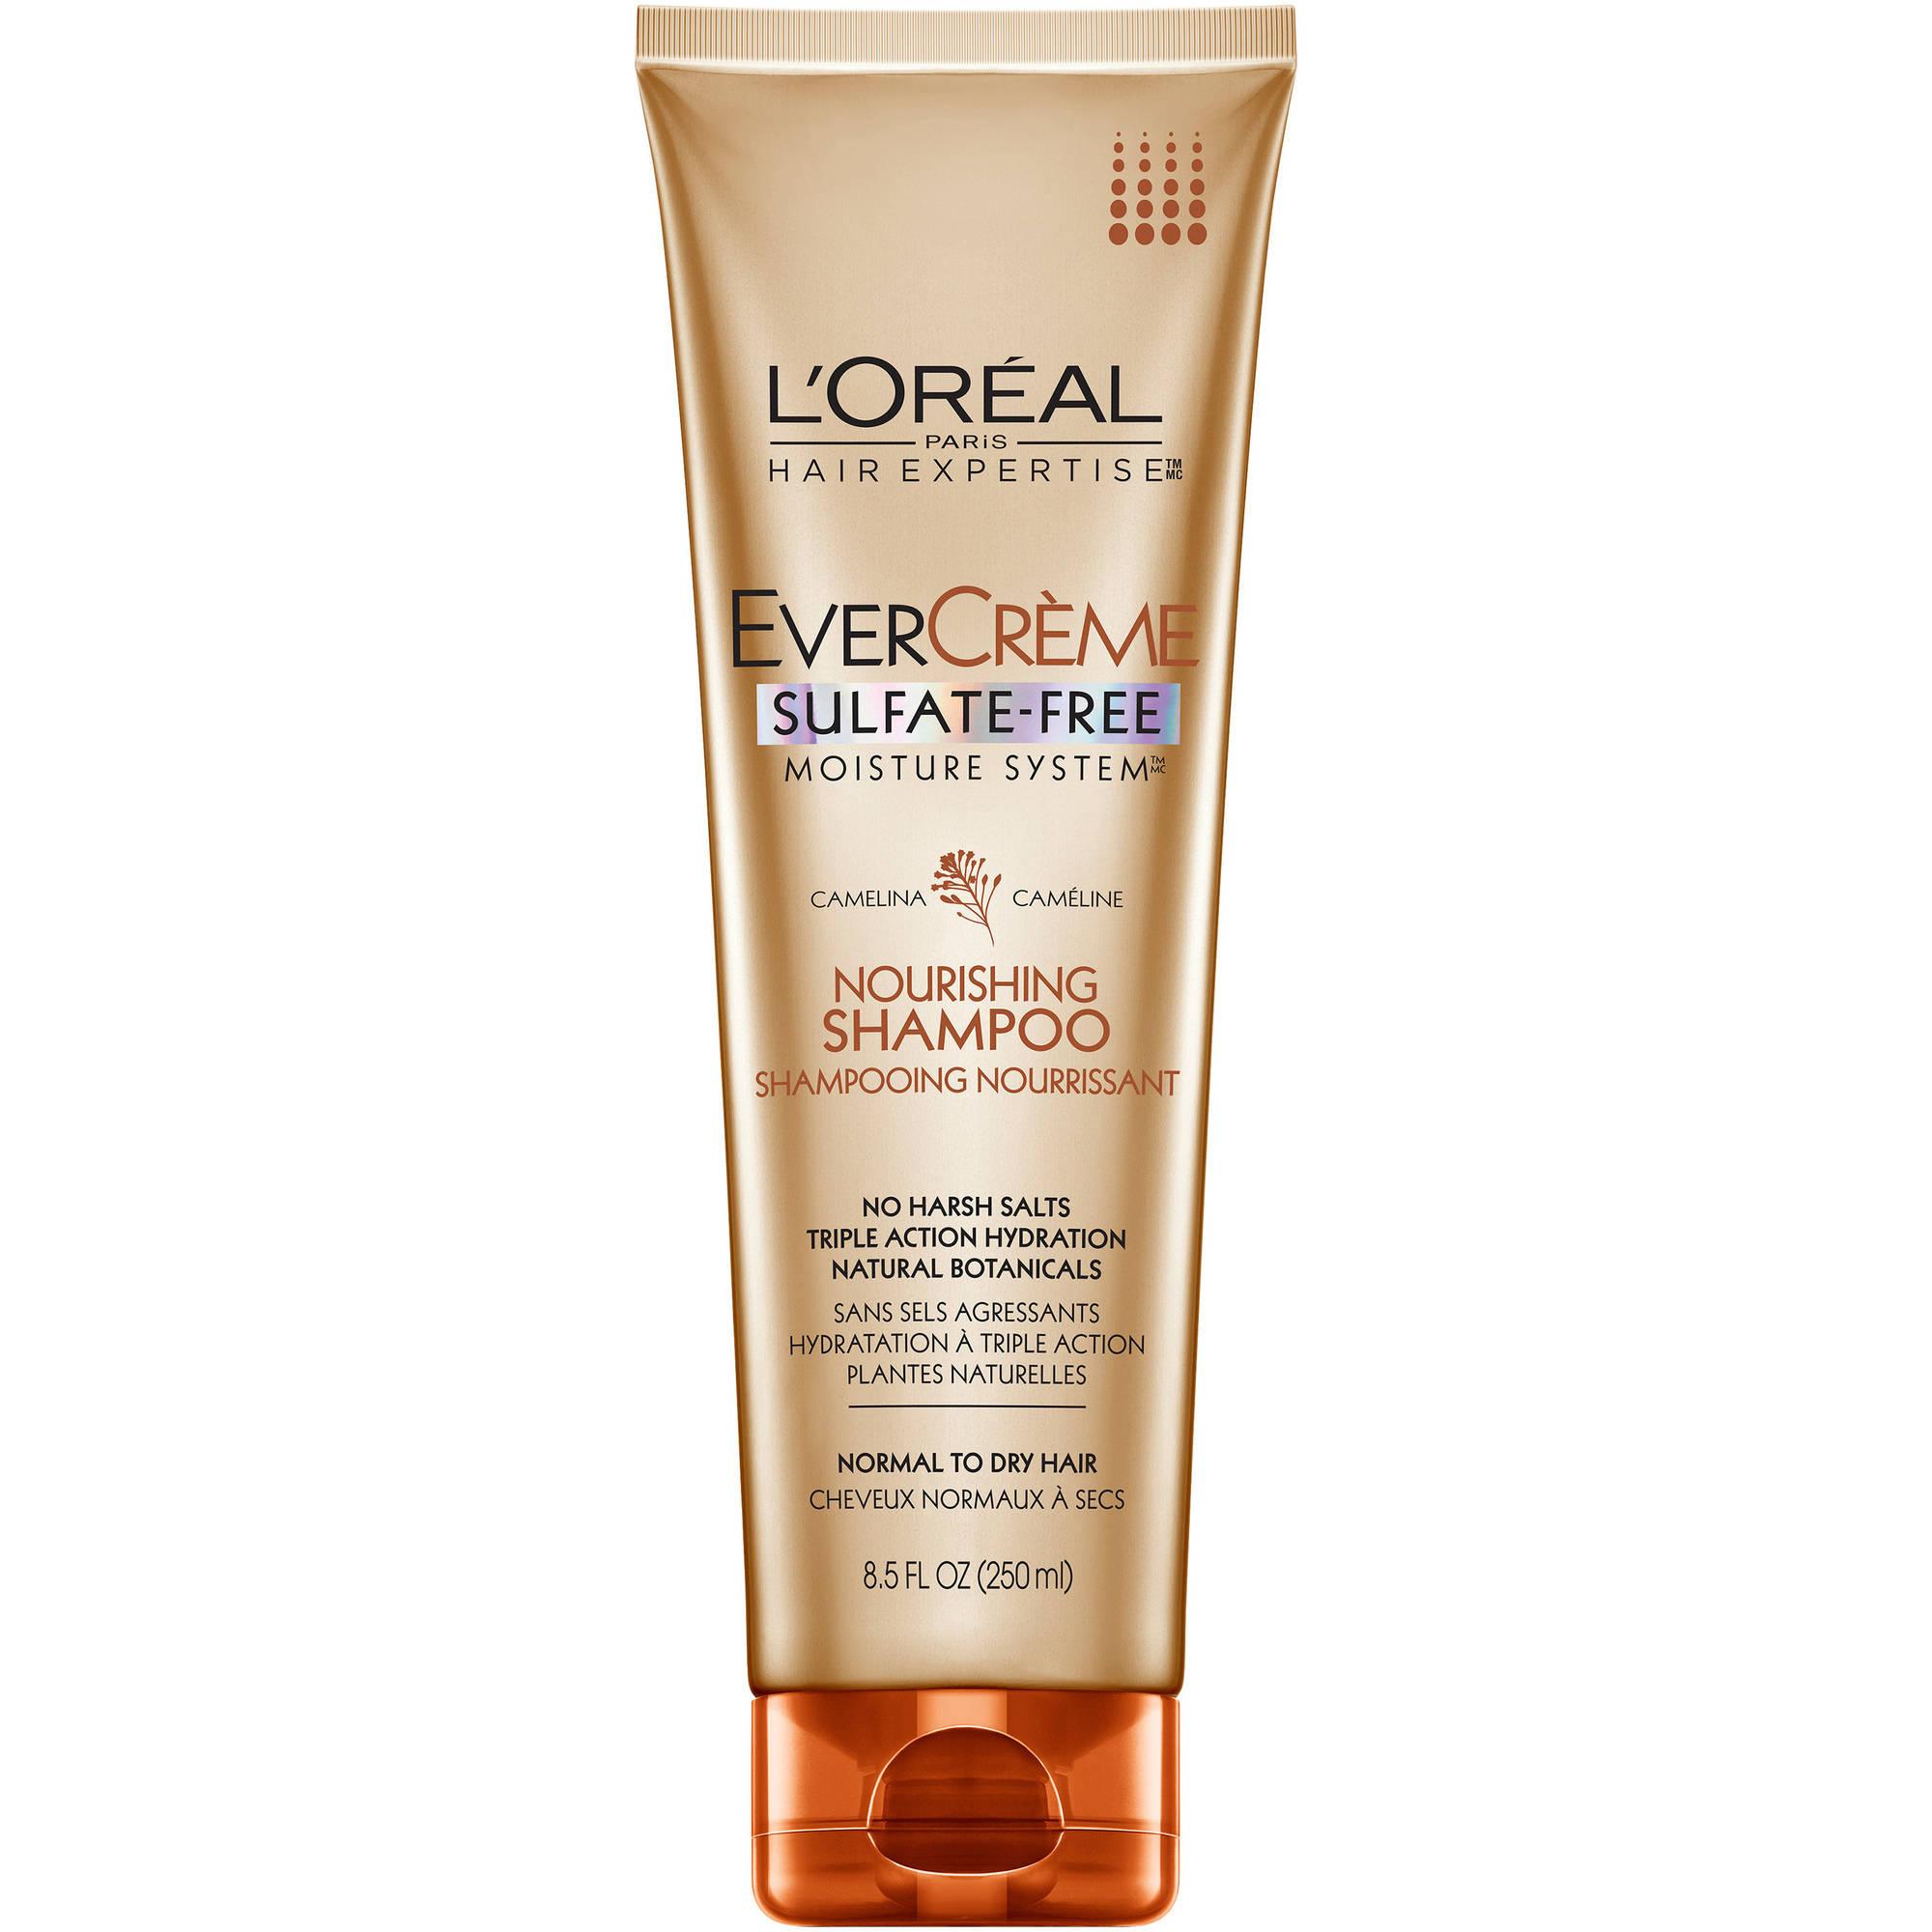 L'Oréal Paris EverCrème Nourishing Shampoo, 8.5 Oz